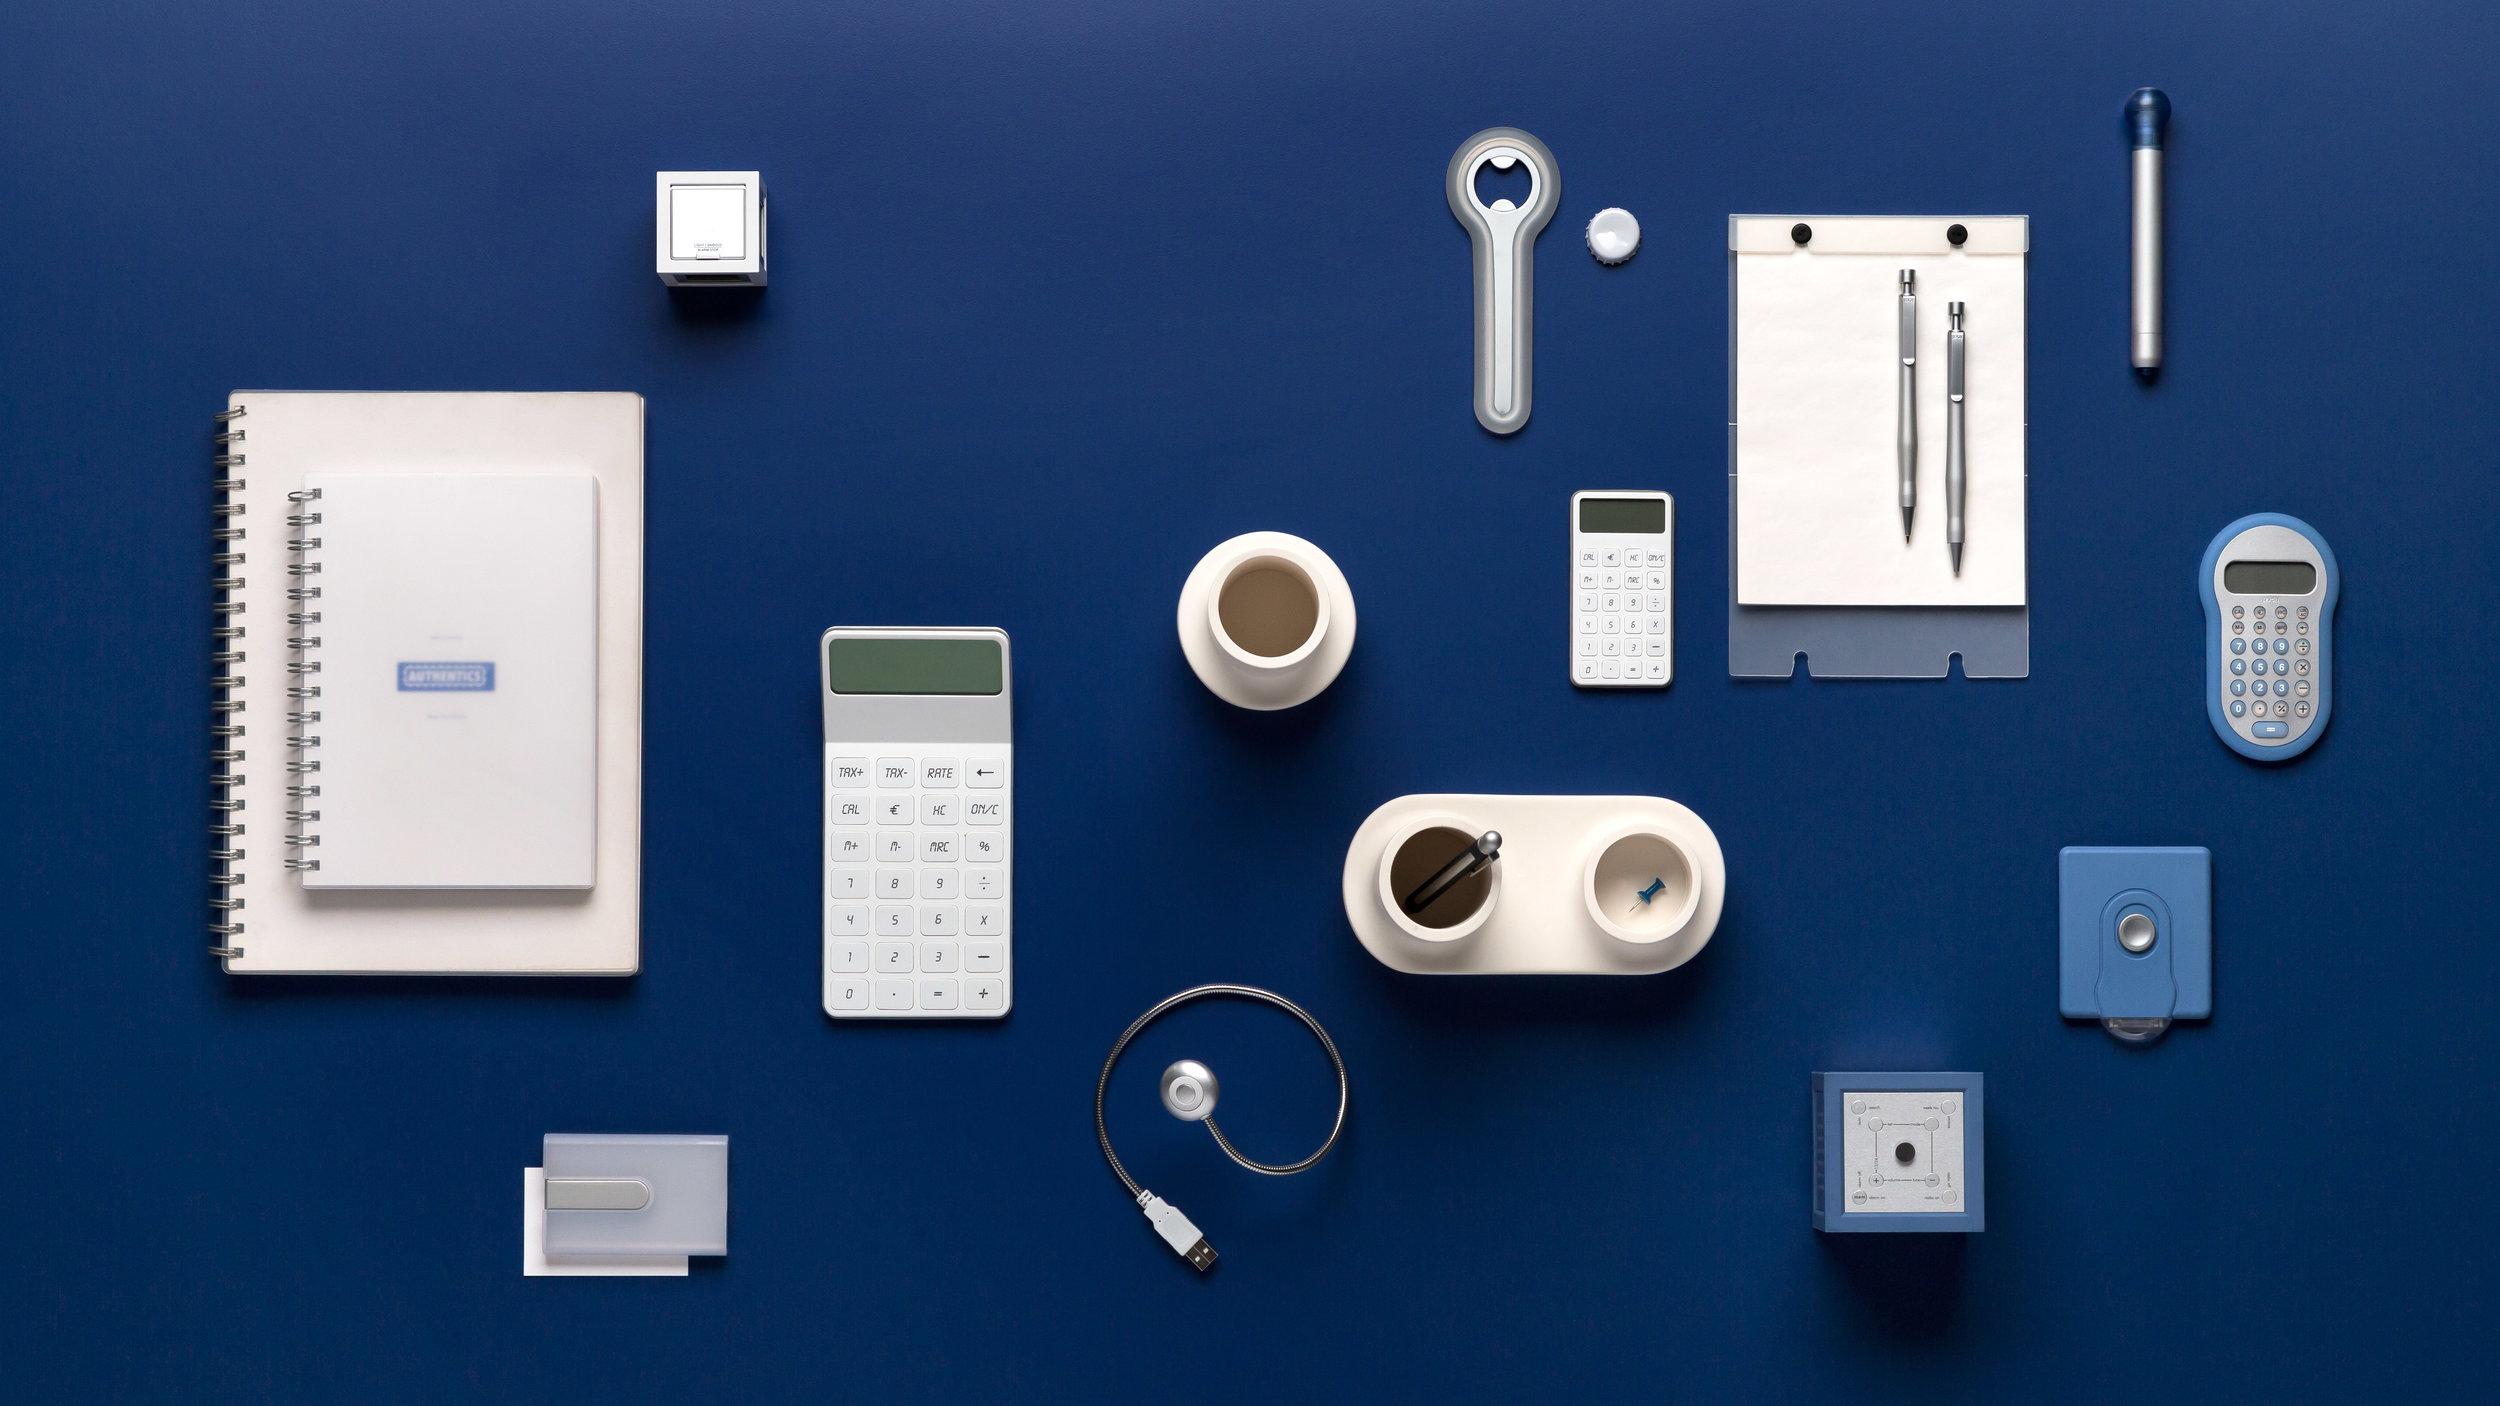 Theo-Williams-Product-Design-Desktop.jpg